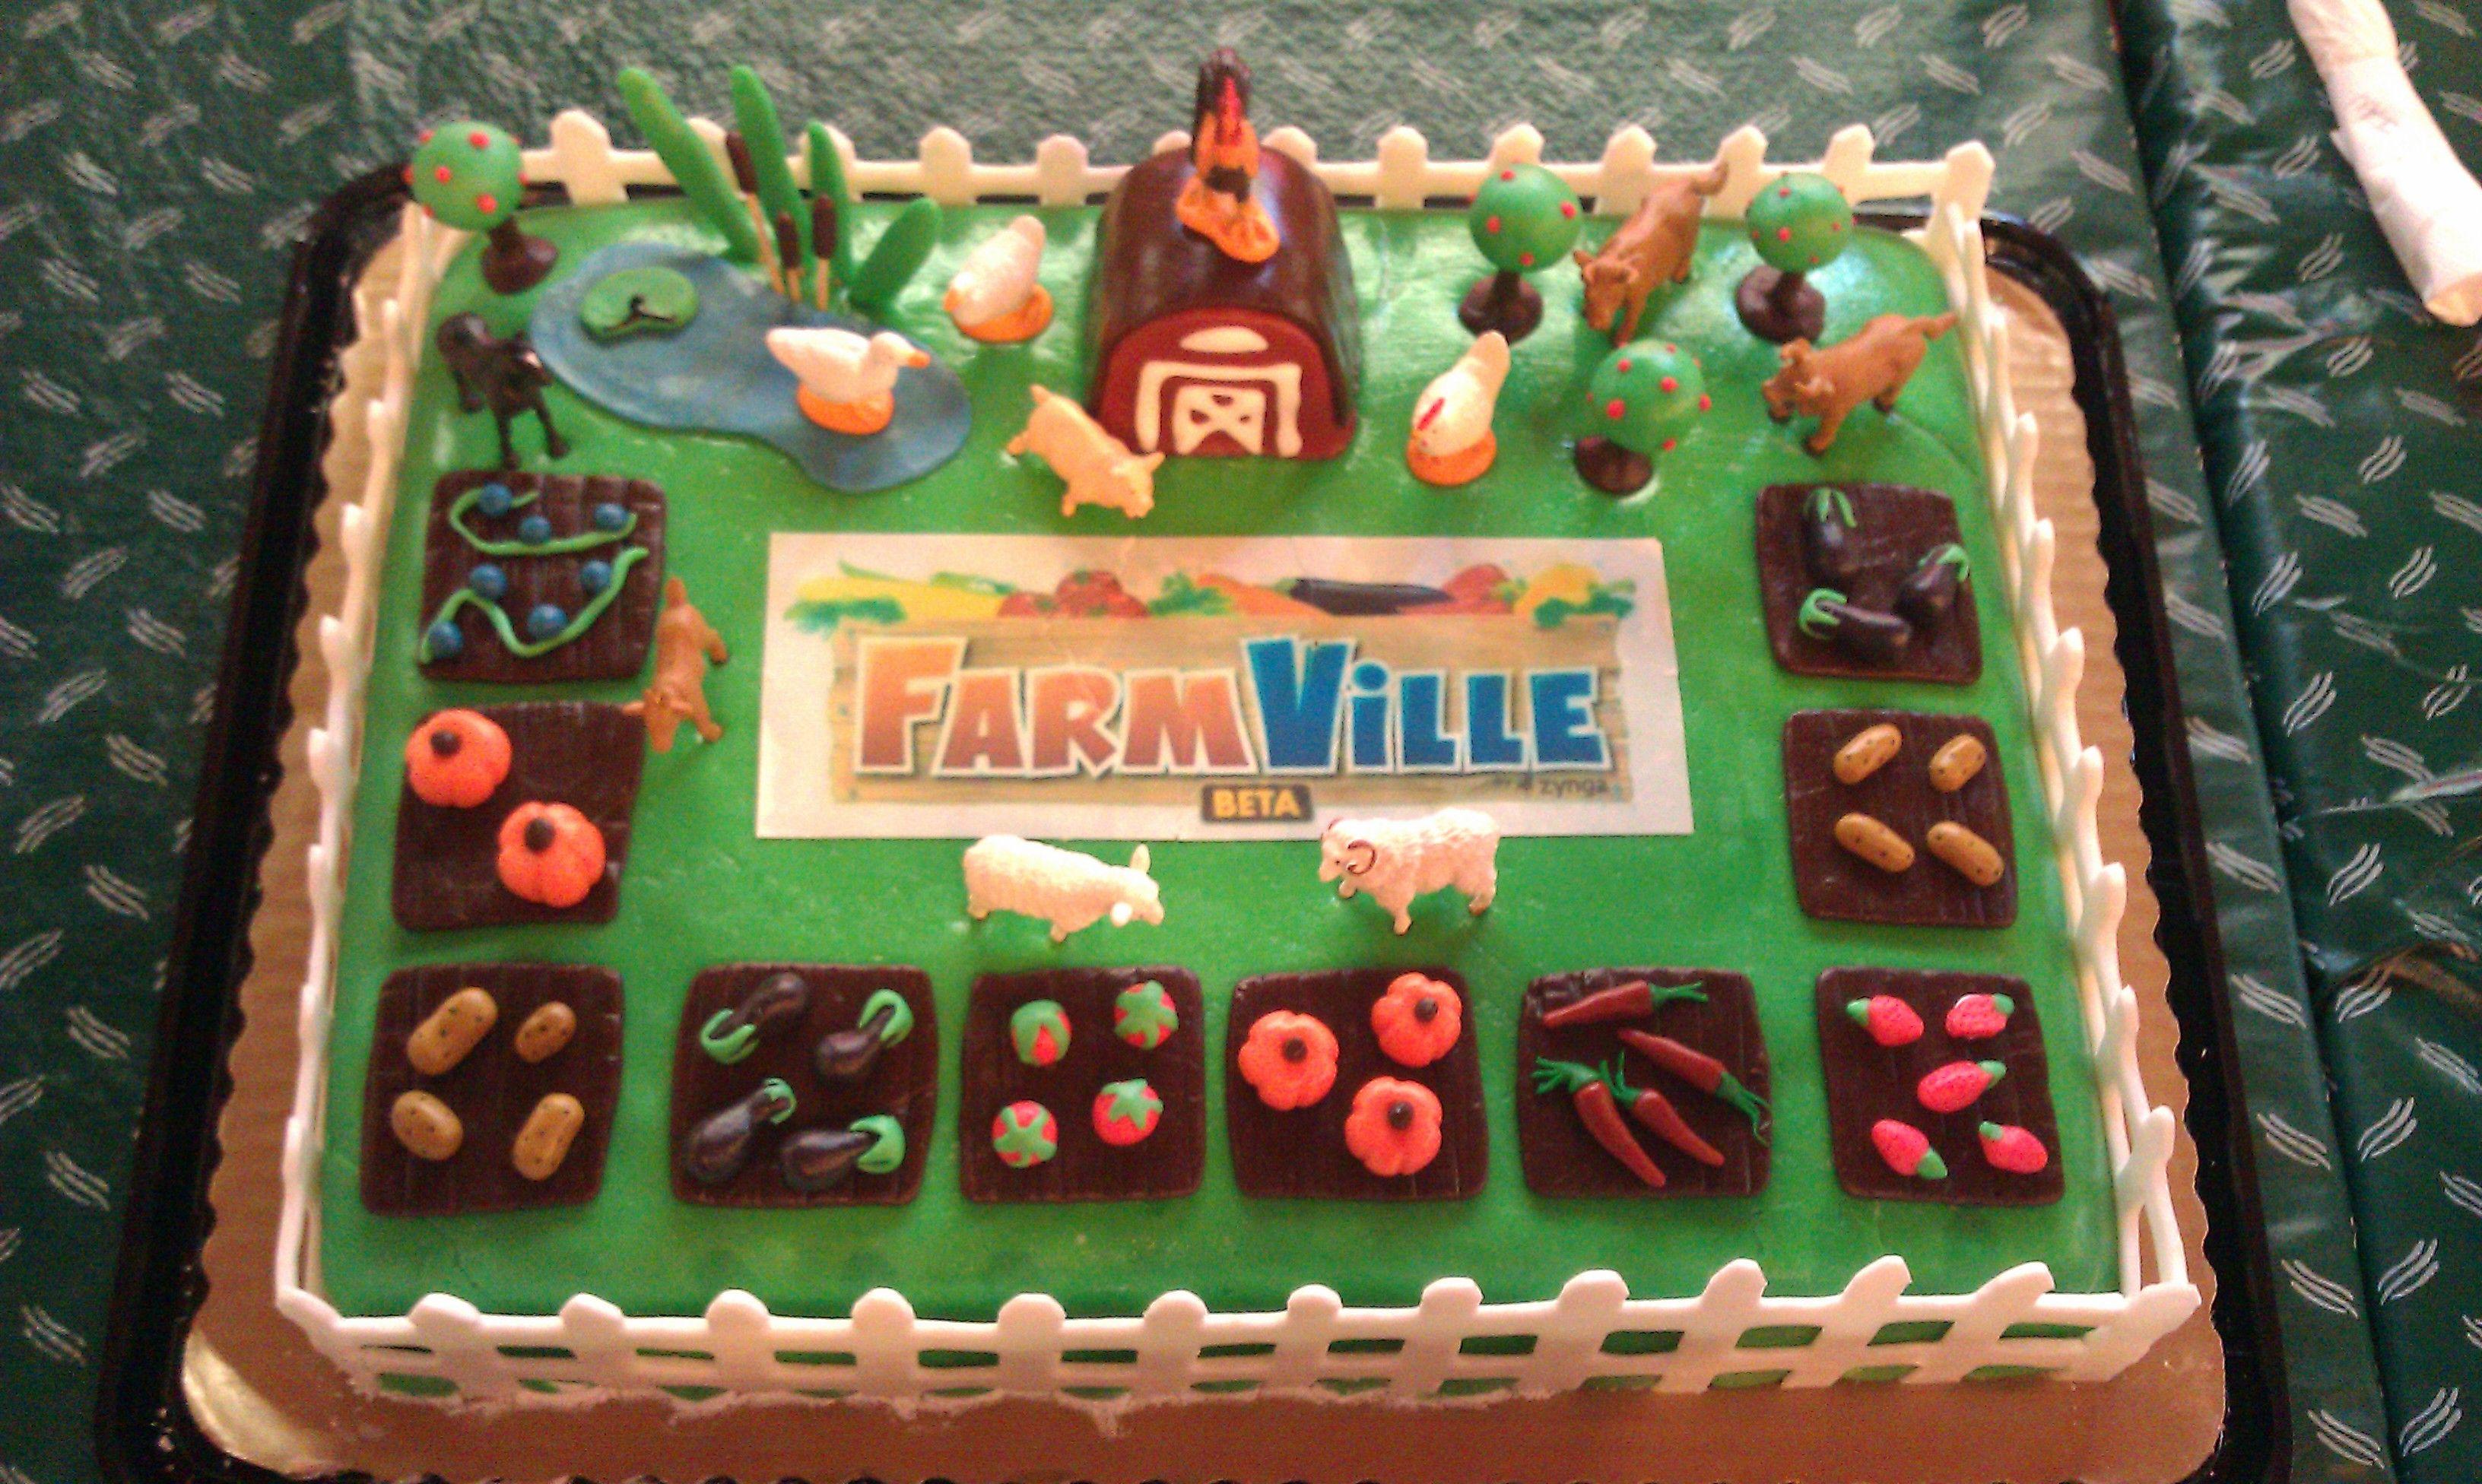 Pin farmville cakepng cake on pinterest for Farmville 2 decorations